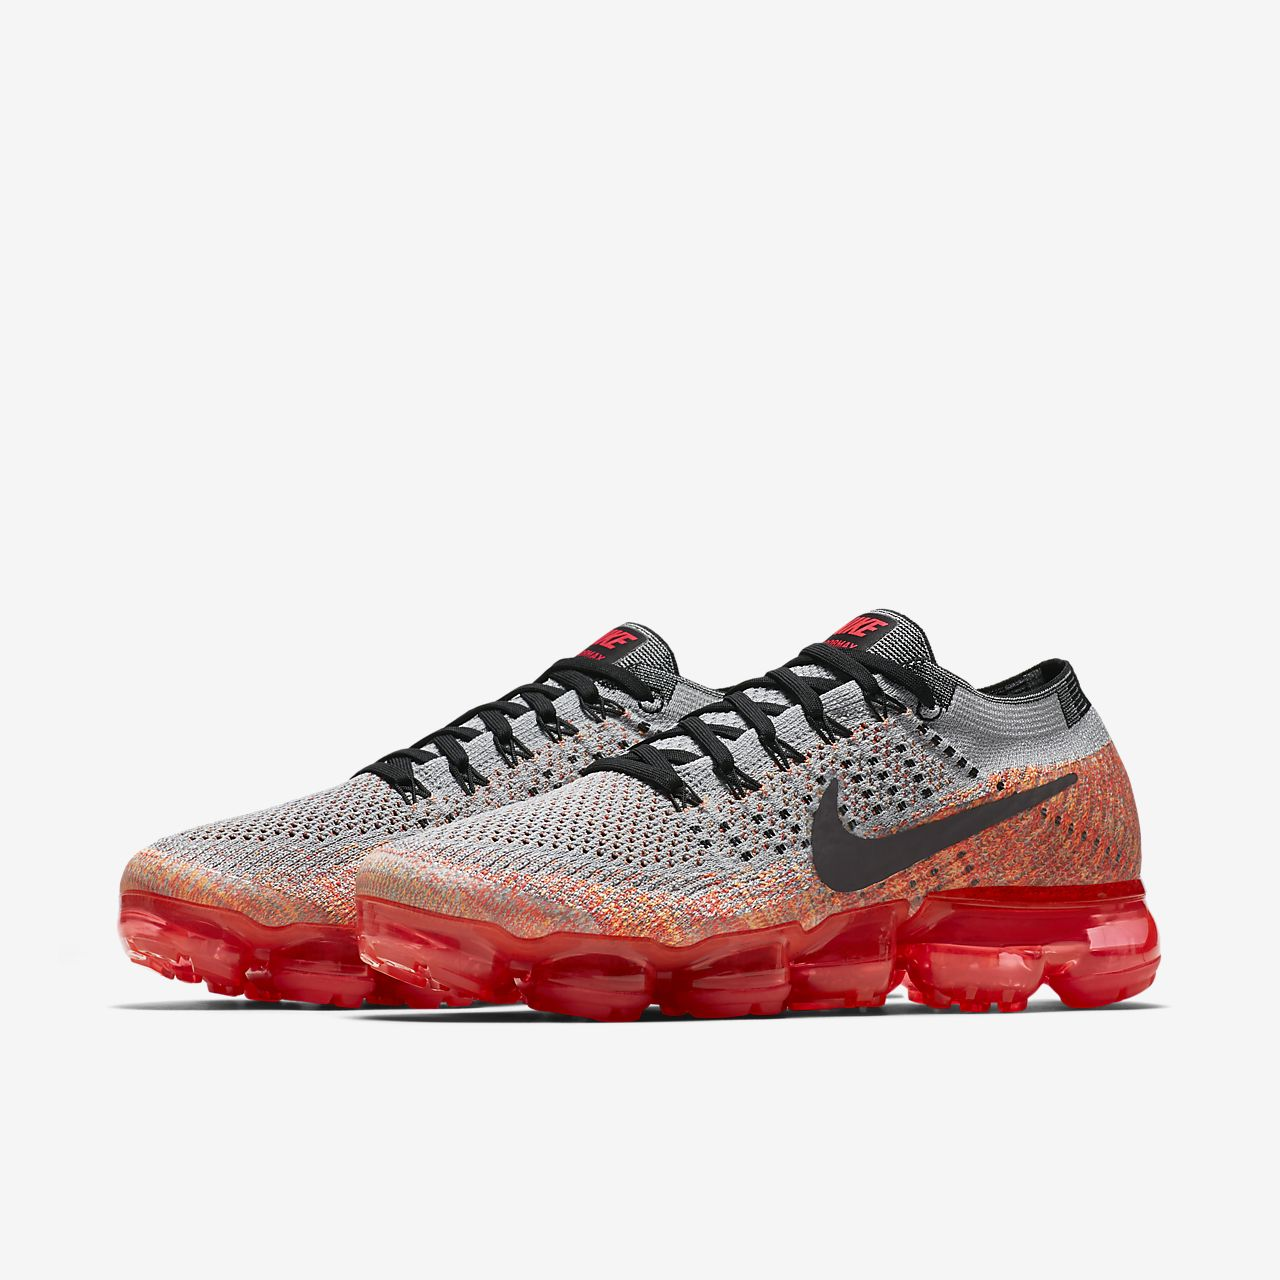 Nike Air Vapormax Womens Red